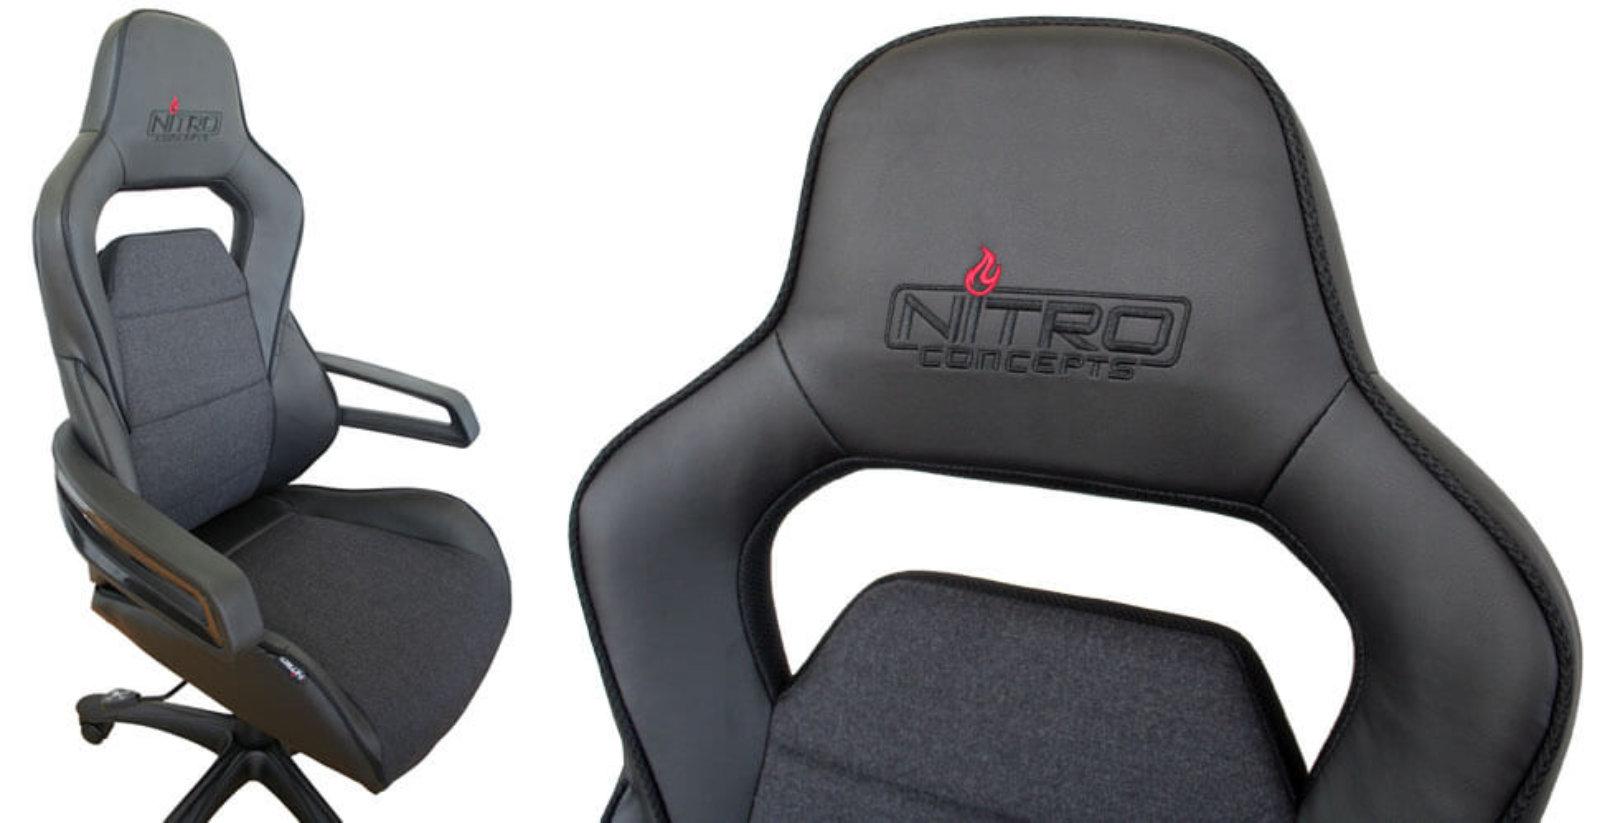 Der Nitro Concepts E220 Gaming Stuhl Im Test Gamer83de